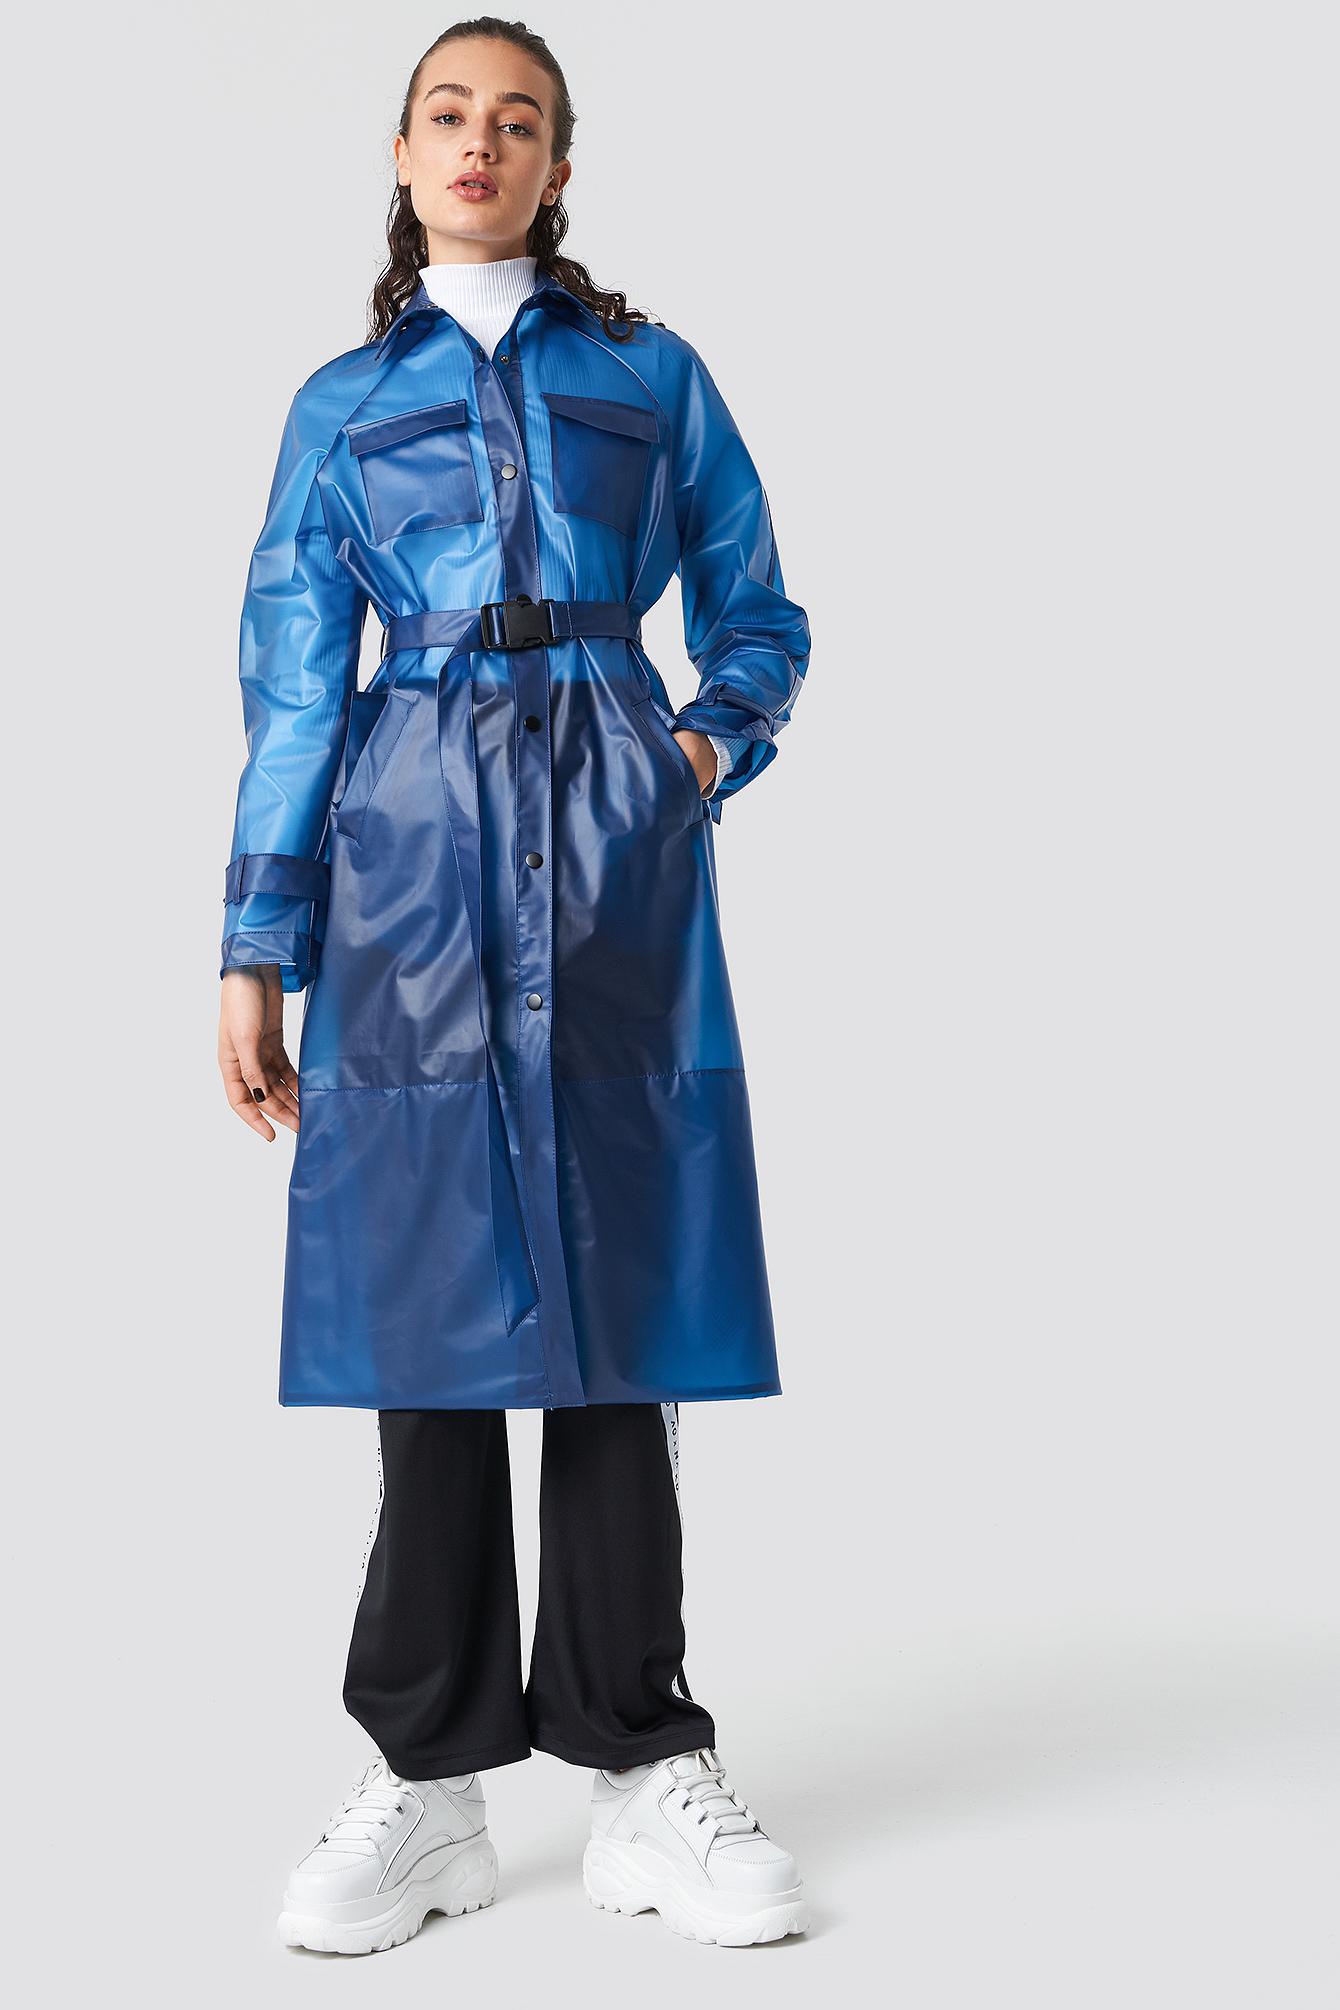 astrid olsen x na-kd -  Rain Coat - Blue